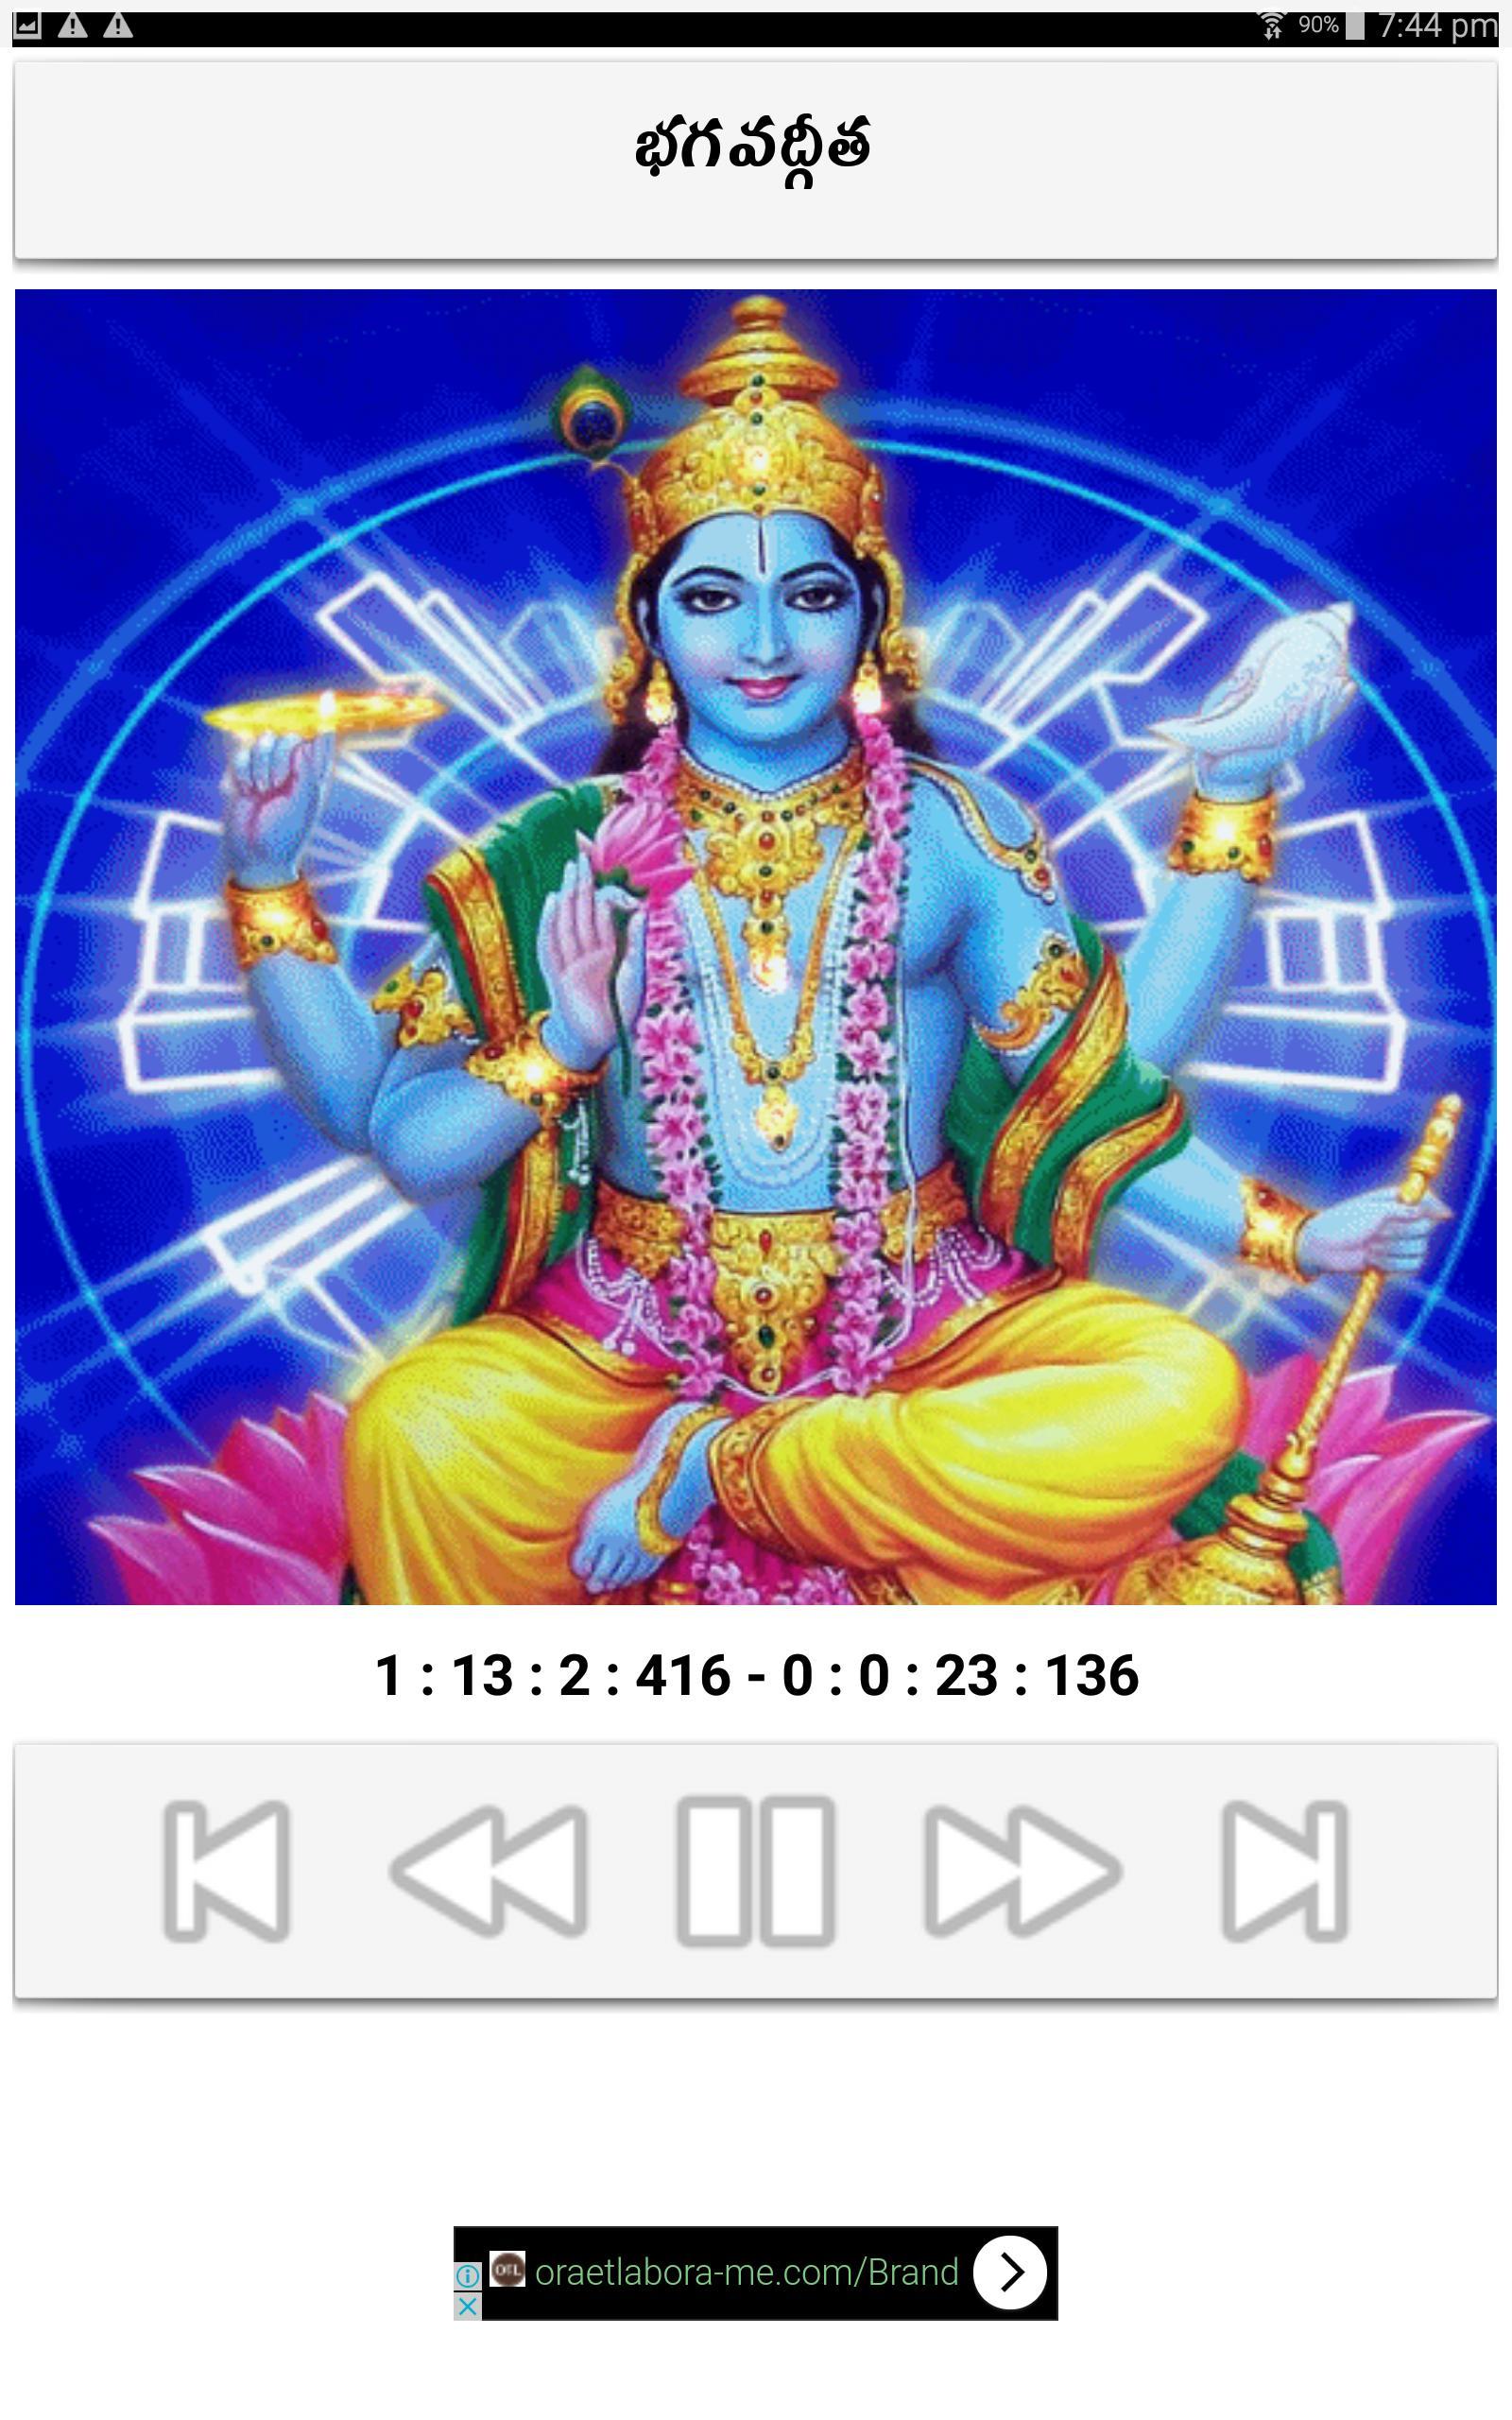 Bhagavad Gita for Android - APK Download